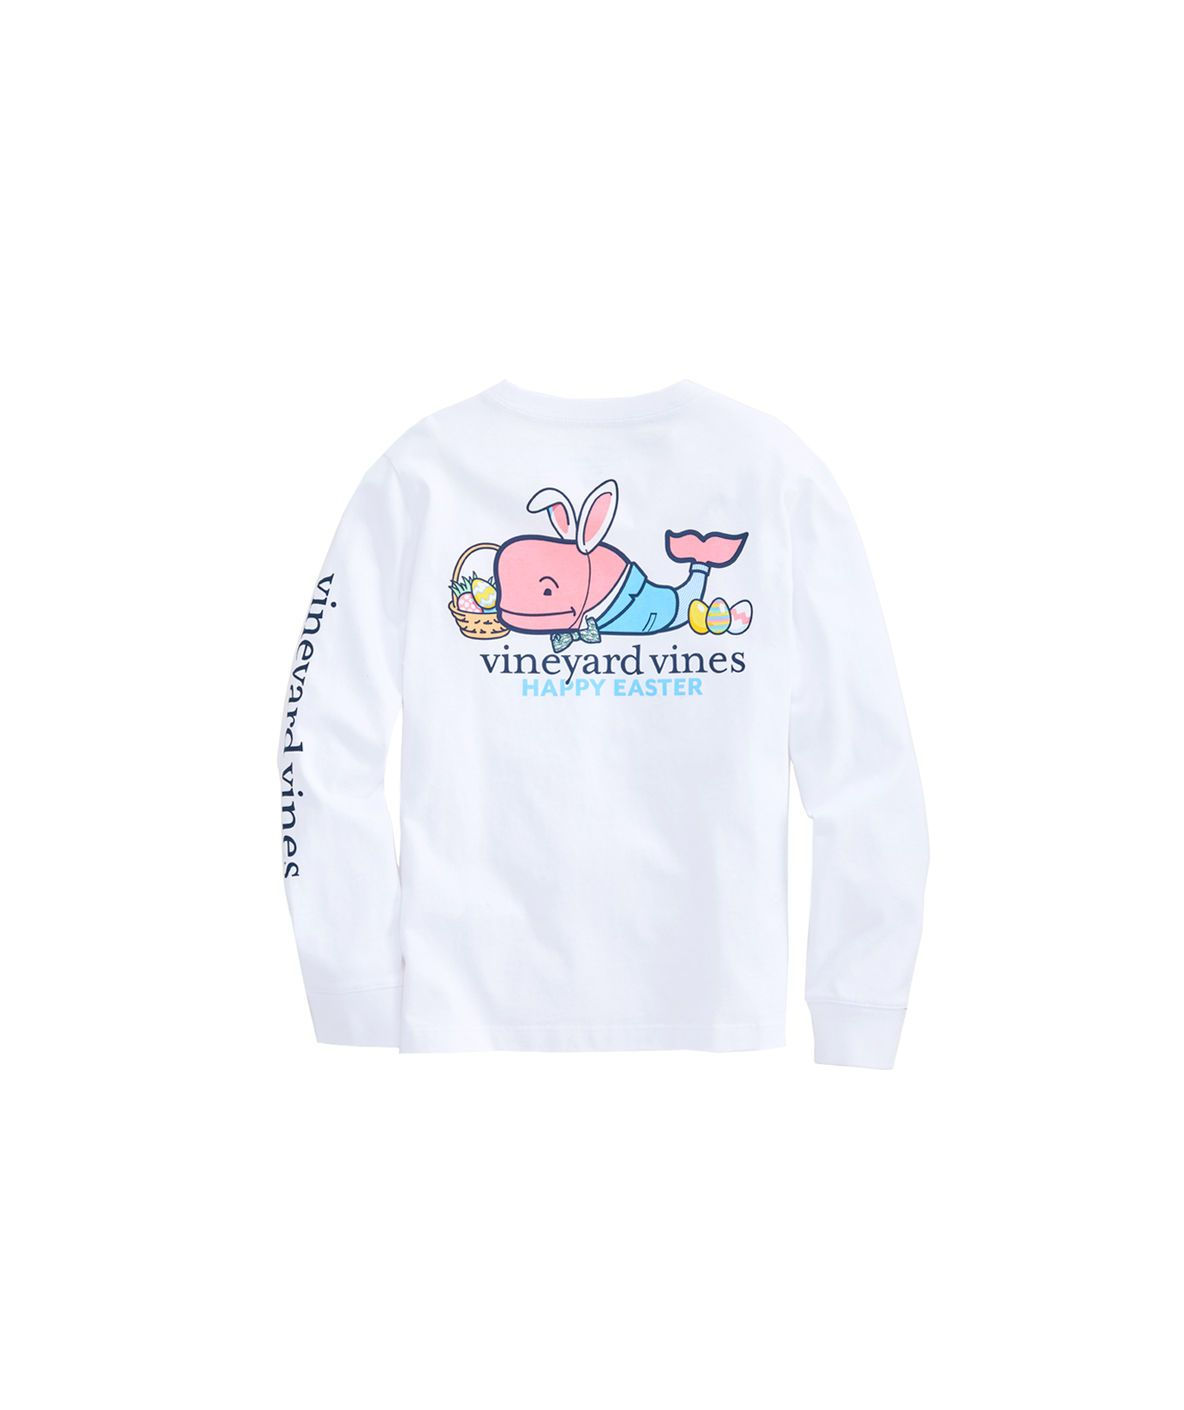 b24cdf8cb Boys Long-Sleeve Boys Easter Whale T-Shirt | Big Boy Teddy | Shirts ...